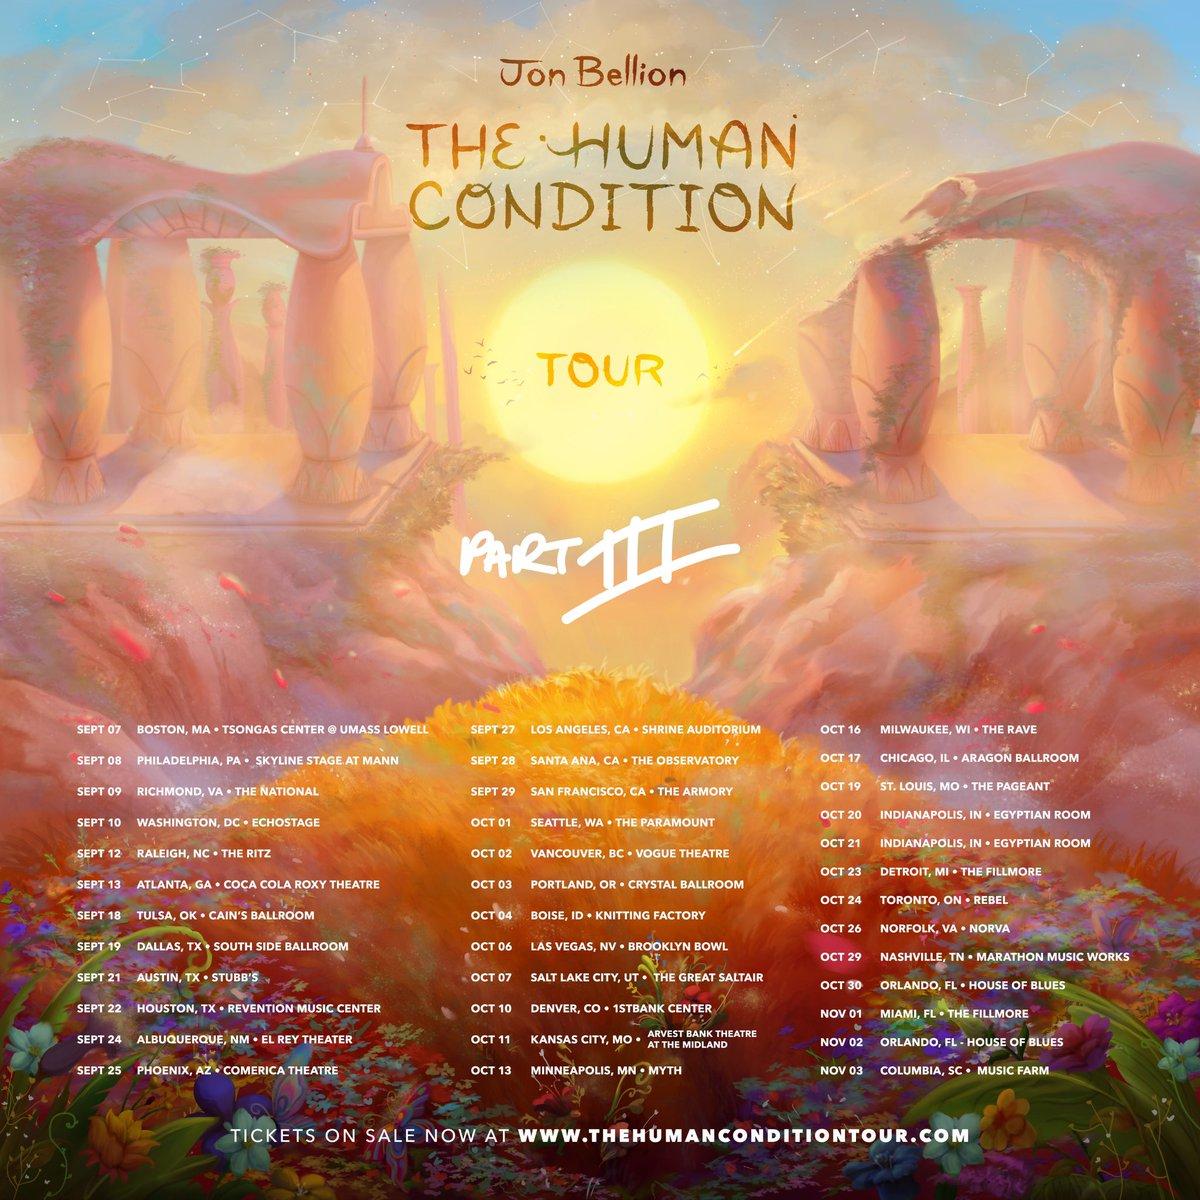 Jon Bellion The Human Condition Tour Setlist